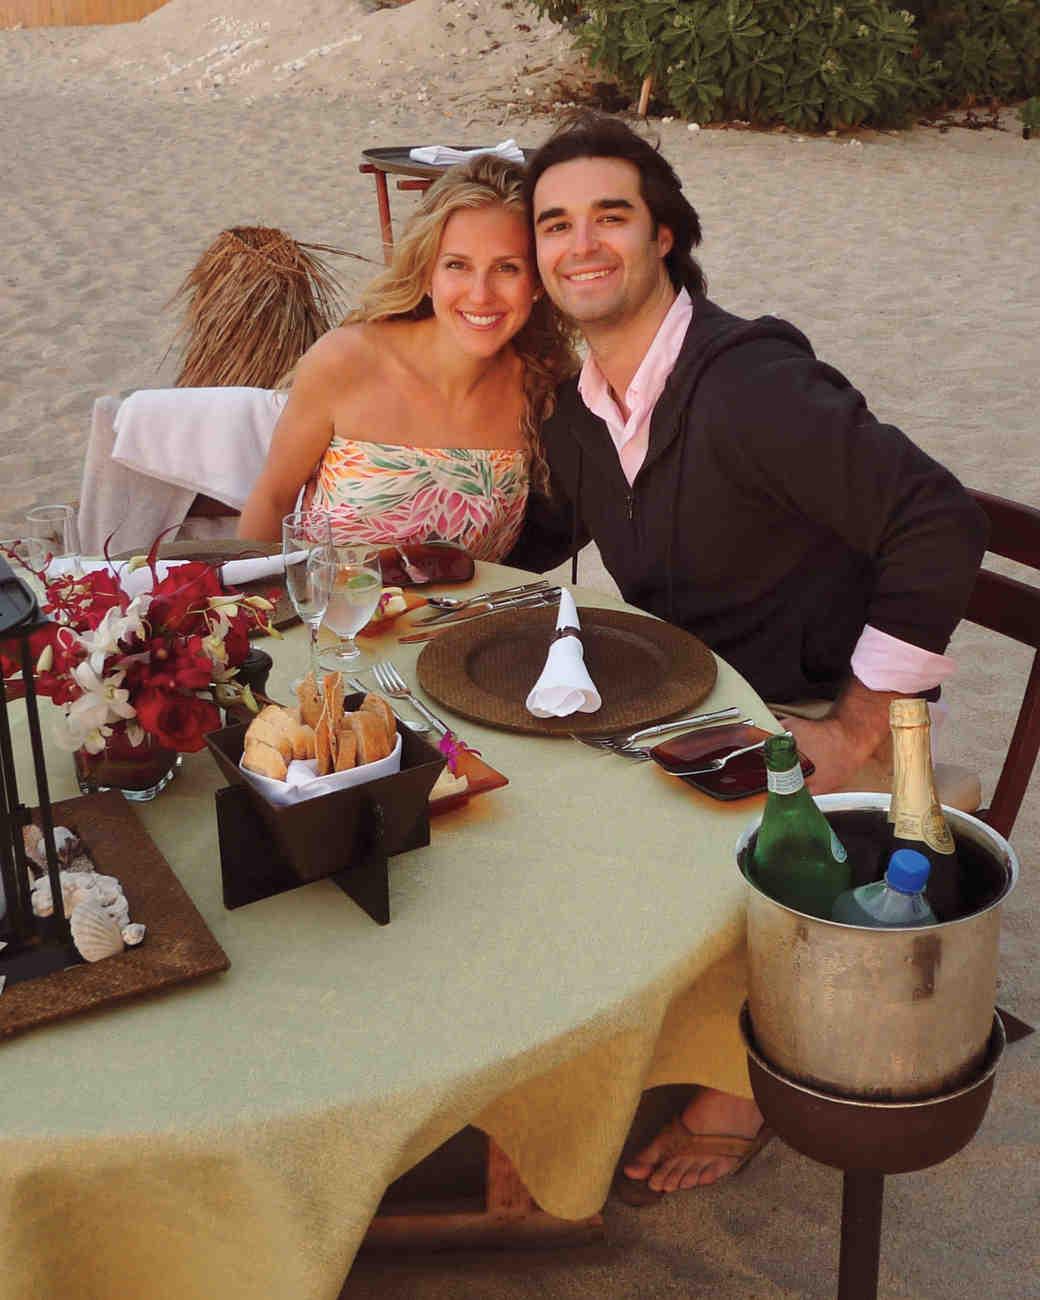 dinner-beach-ms109967.jpg